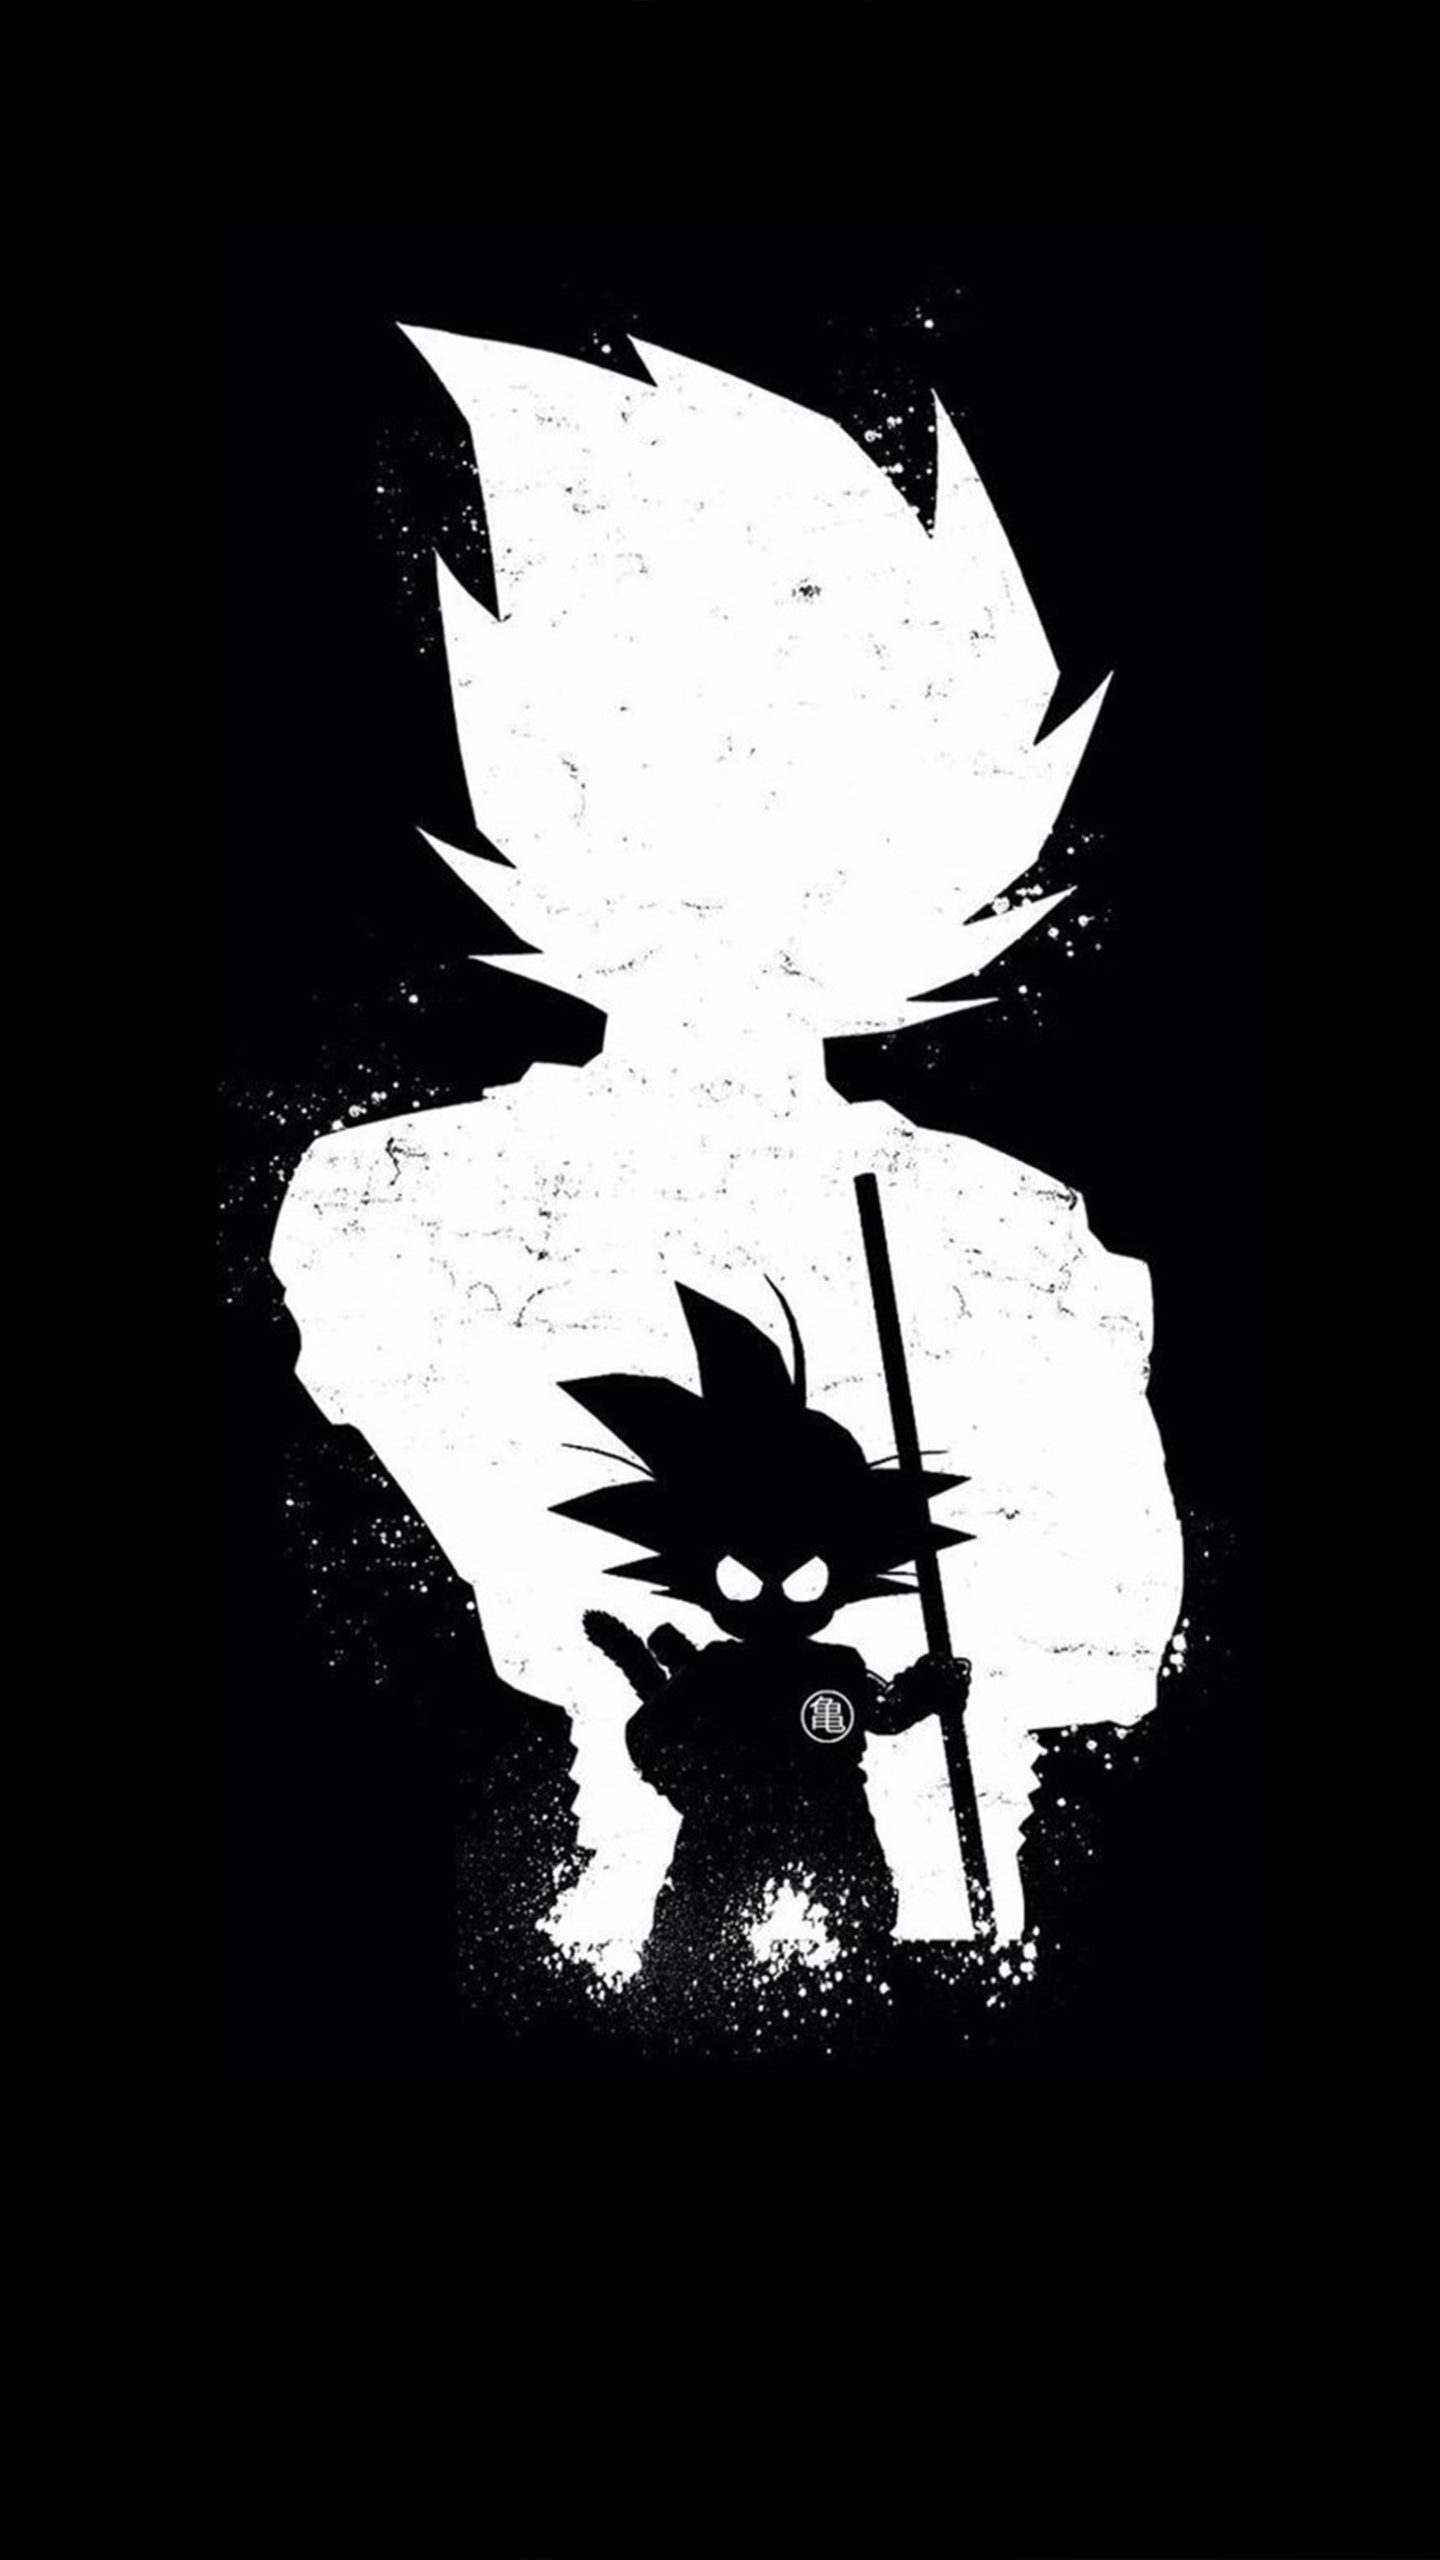 Goku Dark Black Minimal 4k Ultra Hd Mobile Wallpaper